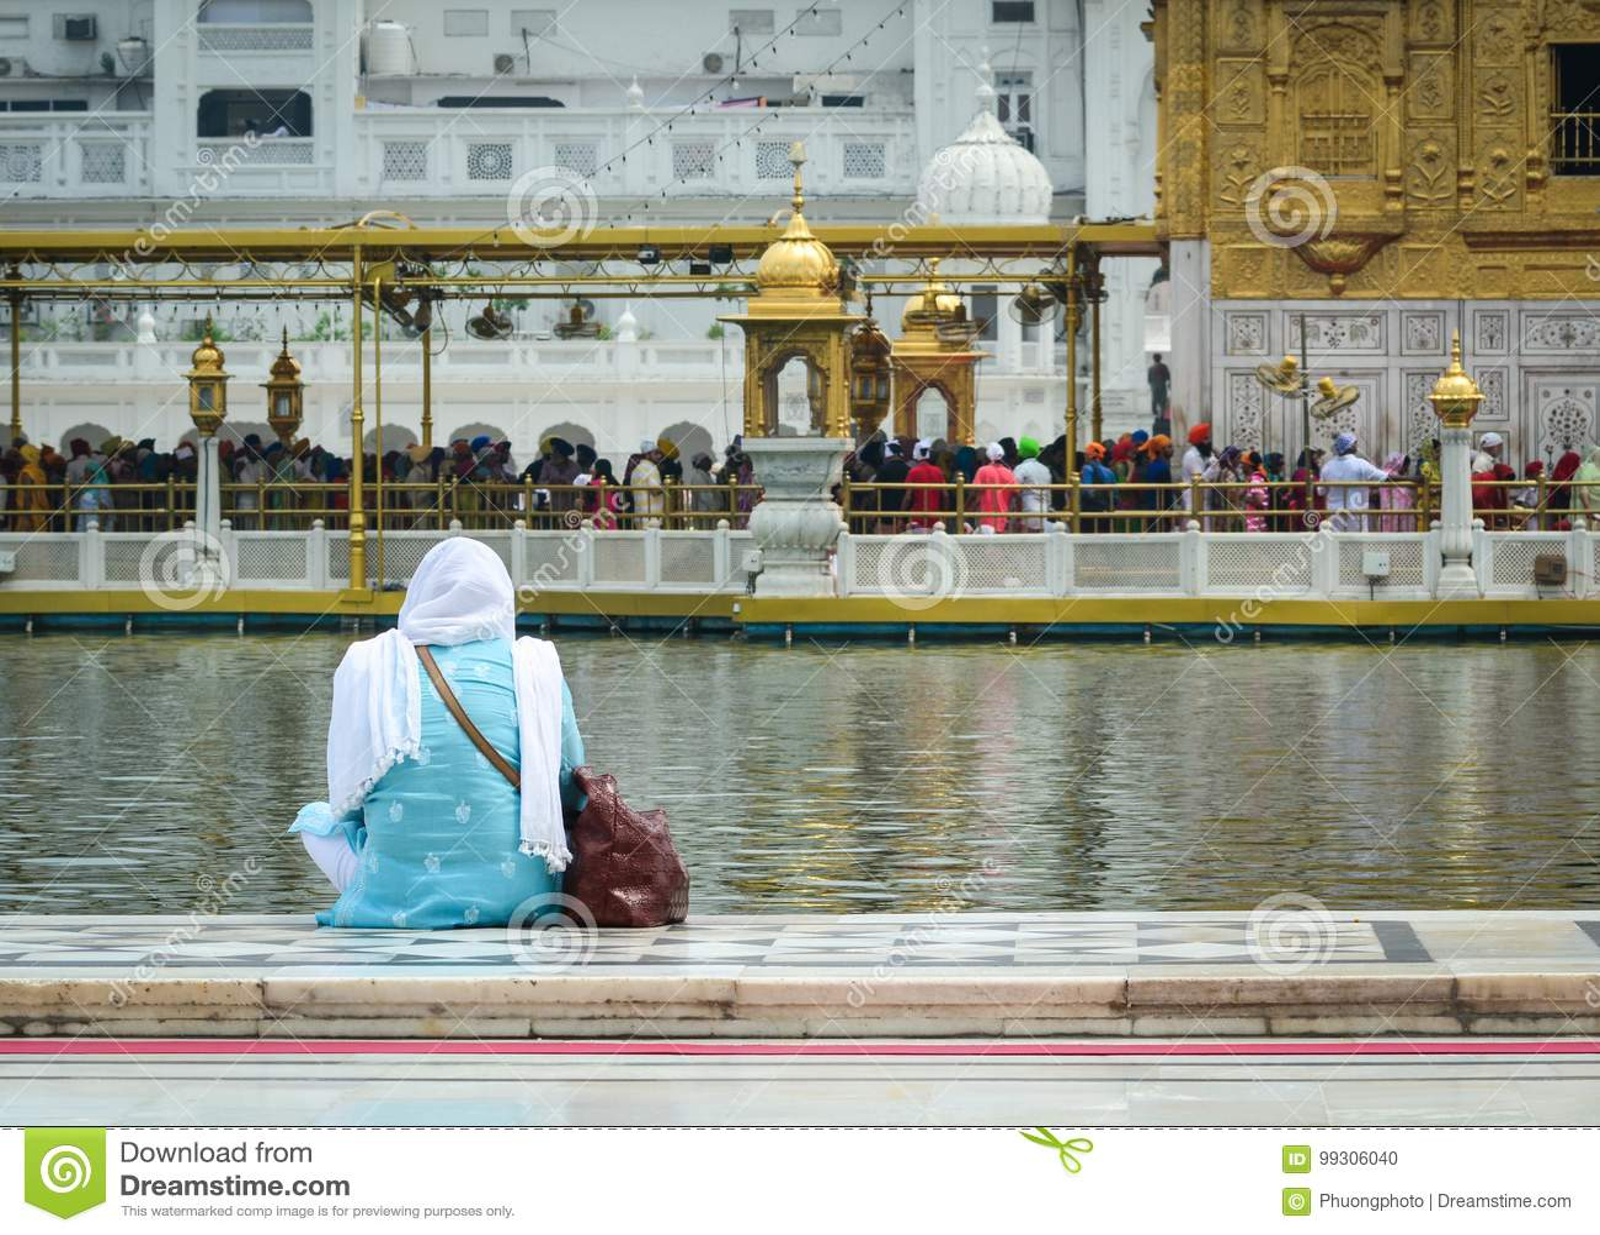 Dating sites amritsar